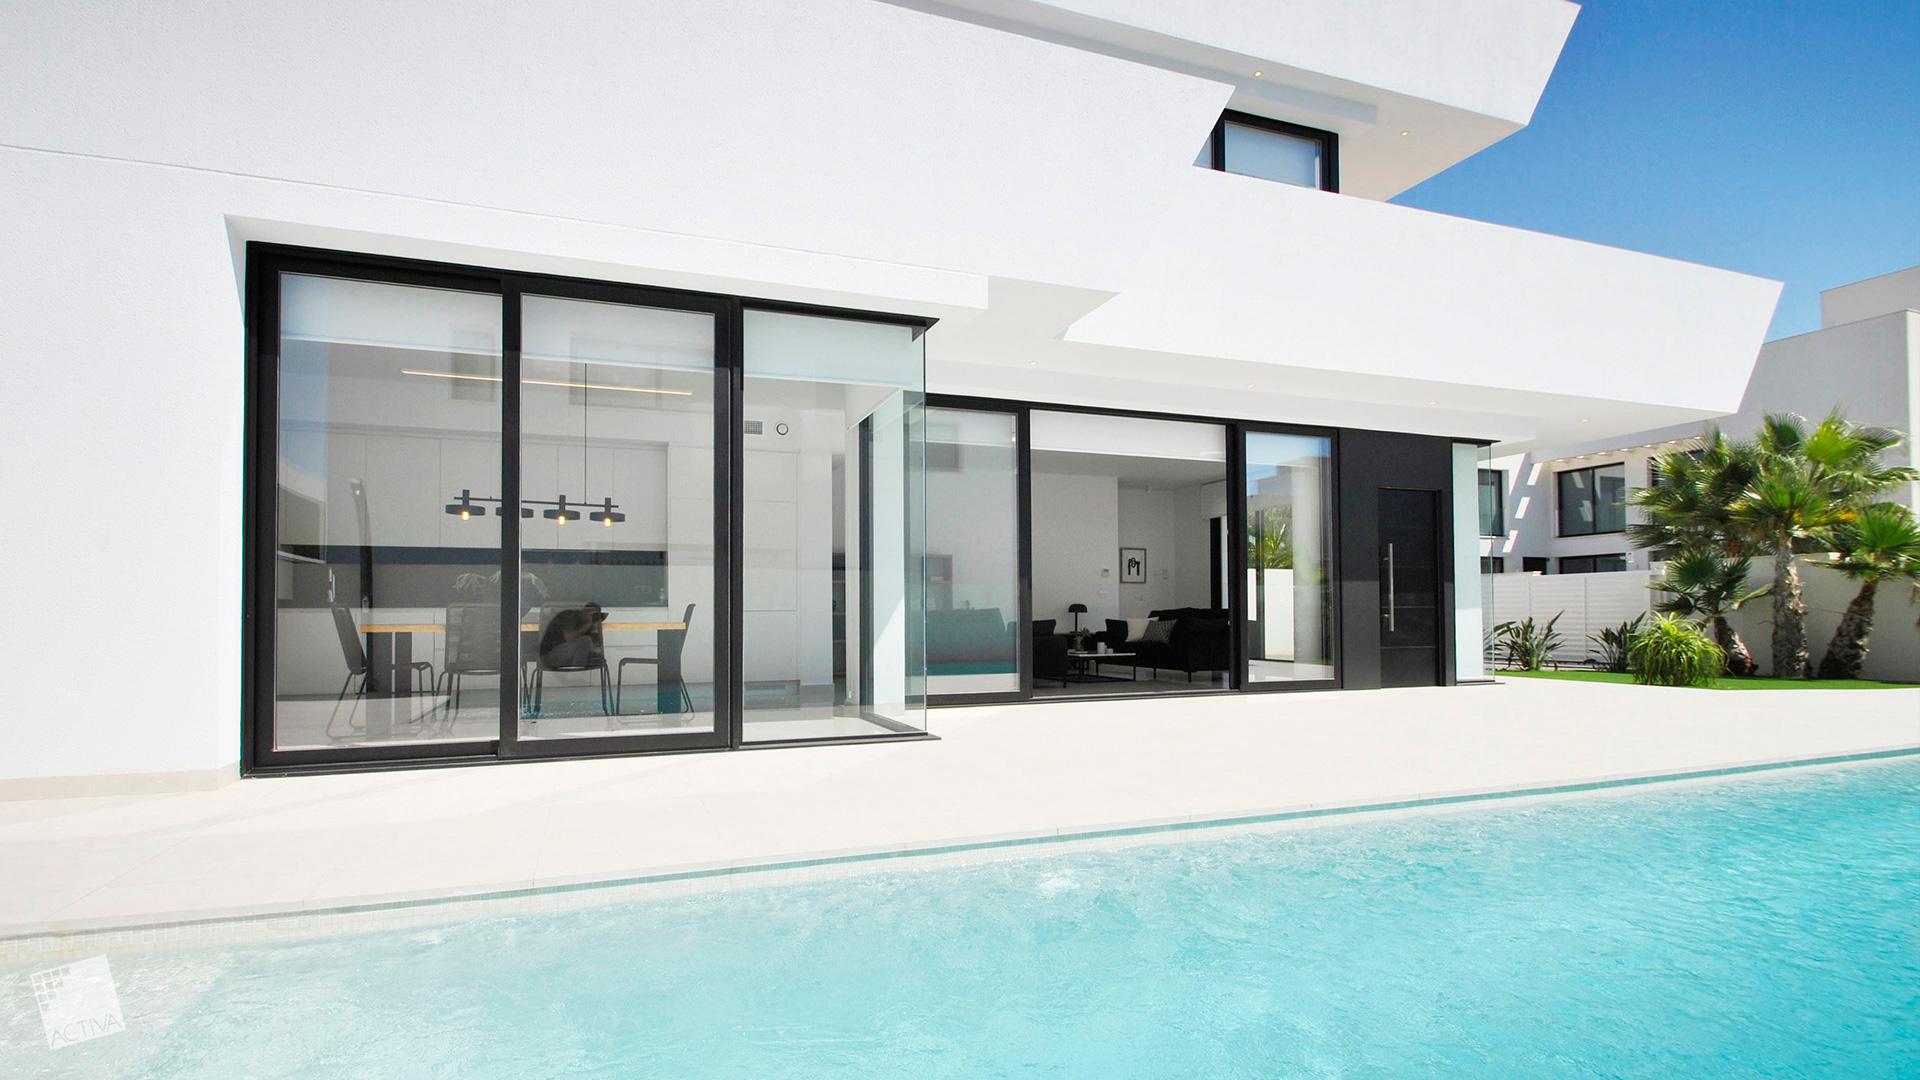 Image Sensational Design Villa in Quesada 0